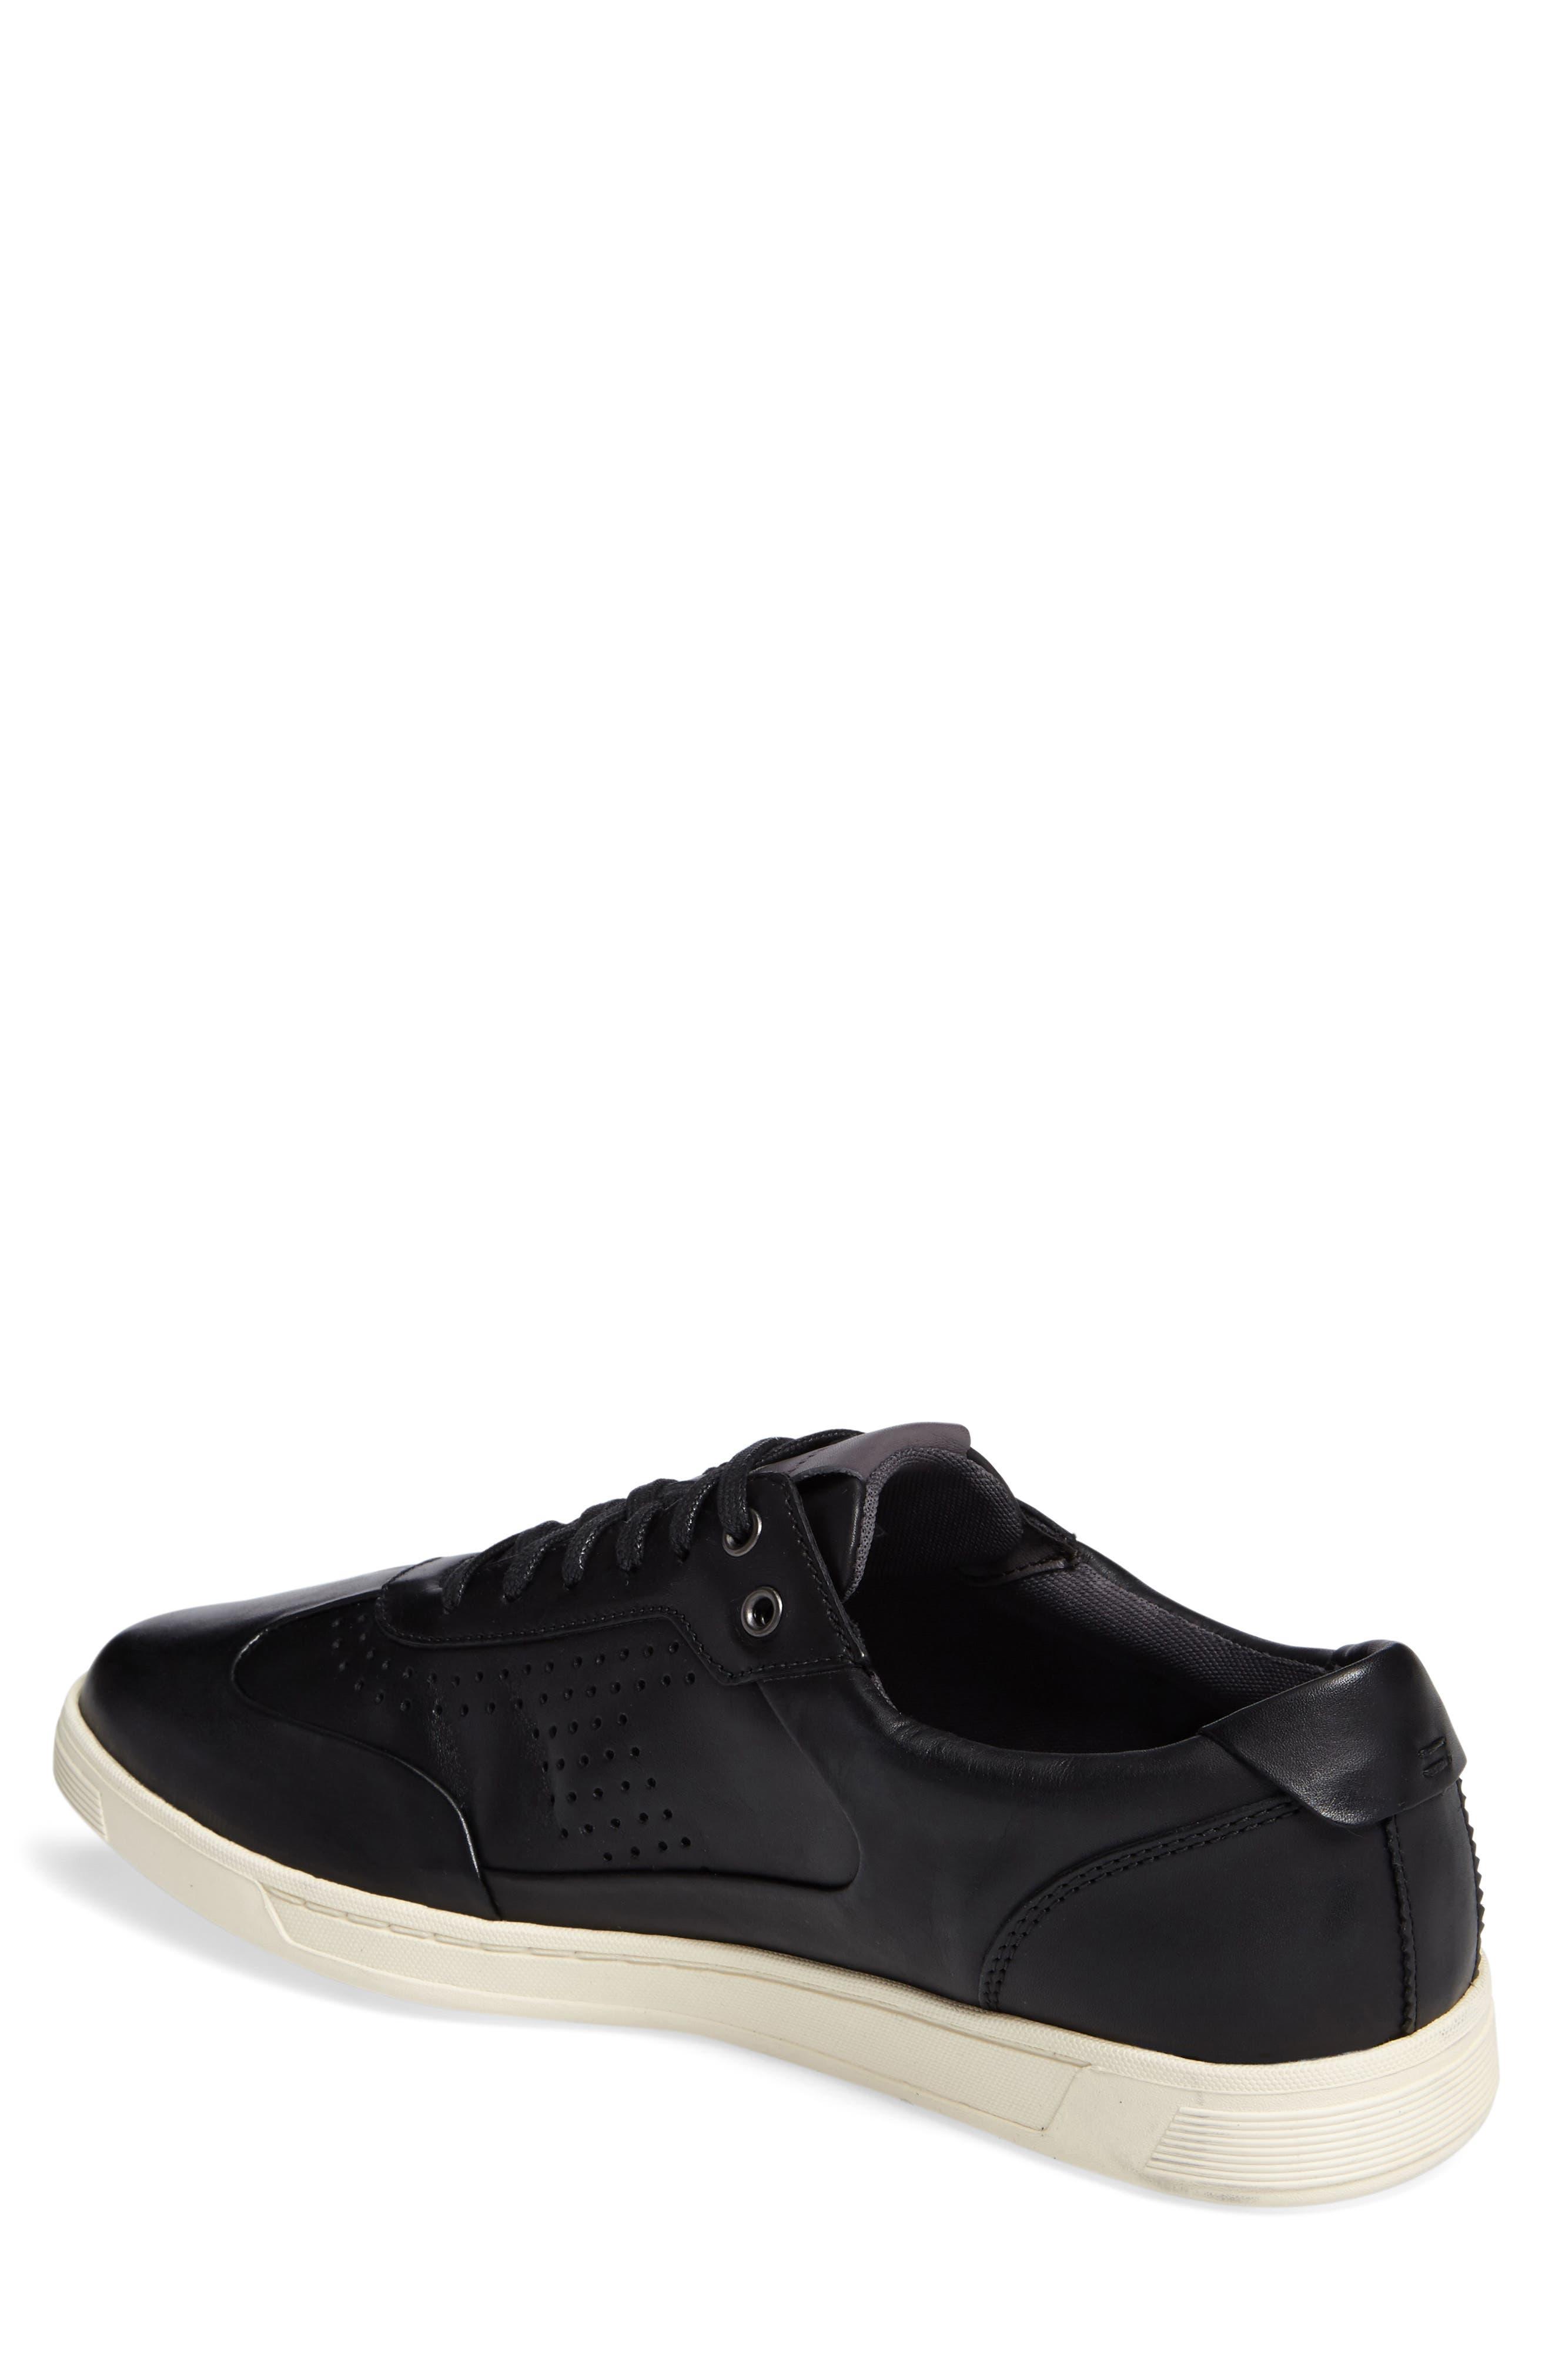 'Vartan Sport Oxford' Sneaker,                             Alternate thumbnail 20, color,